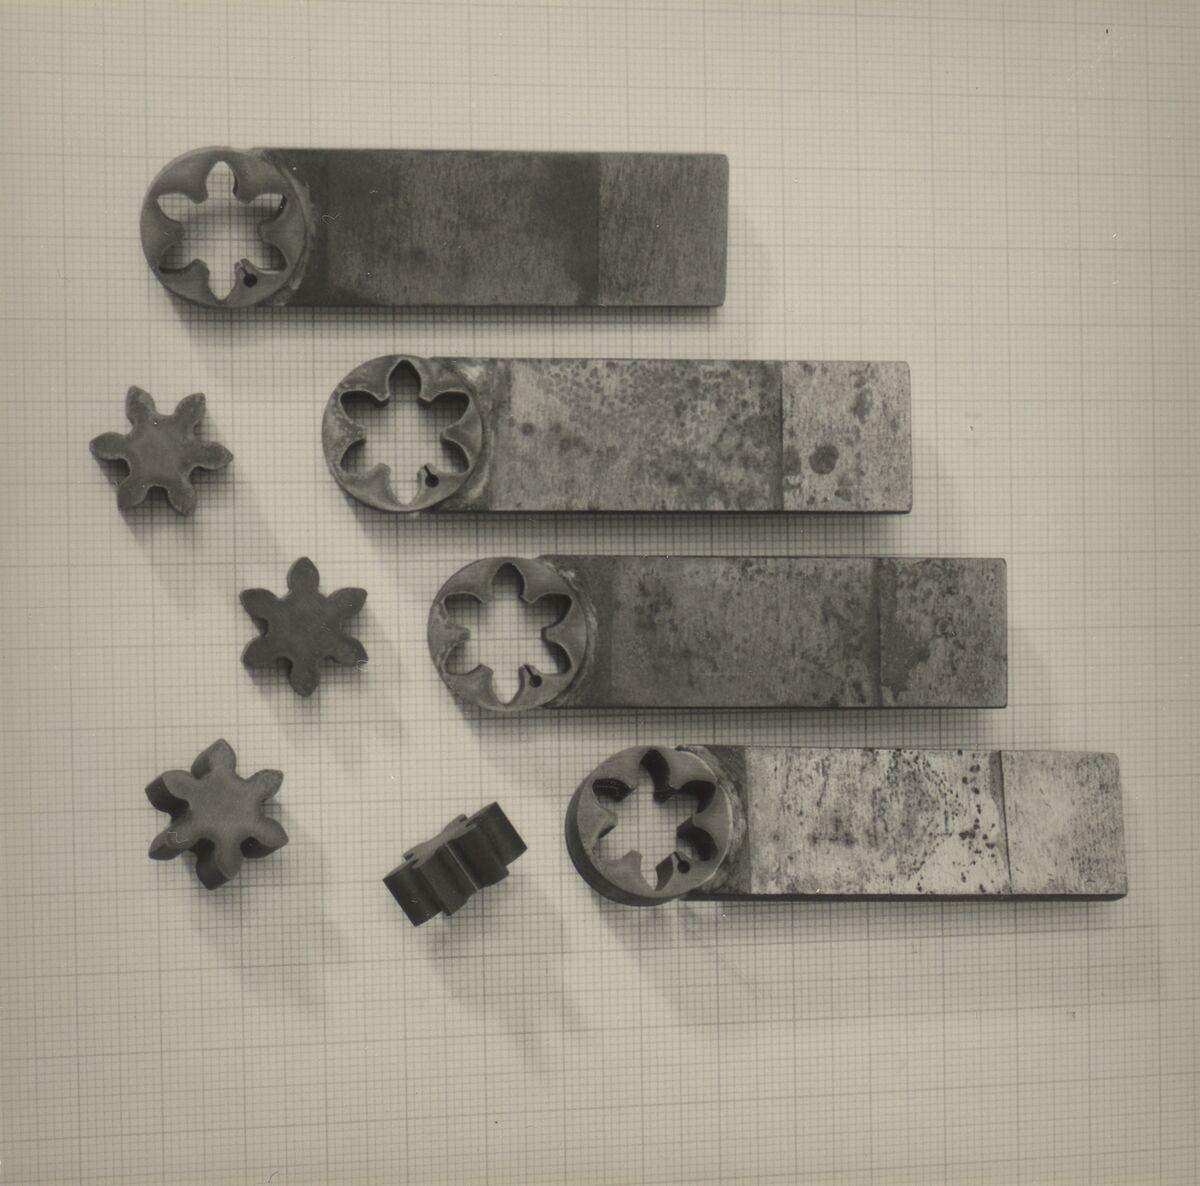 GFA 42/37051: Zahnprofil-Elektroden aus Wolfram-Kupfer